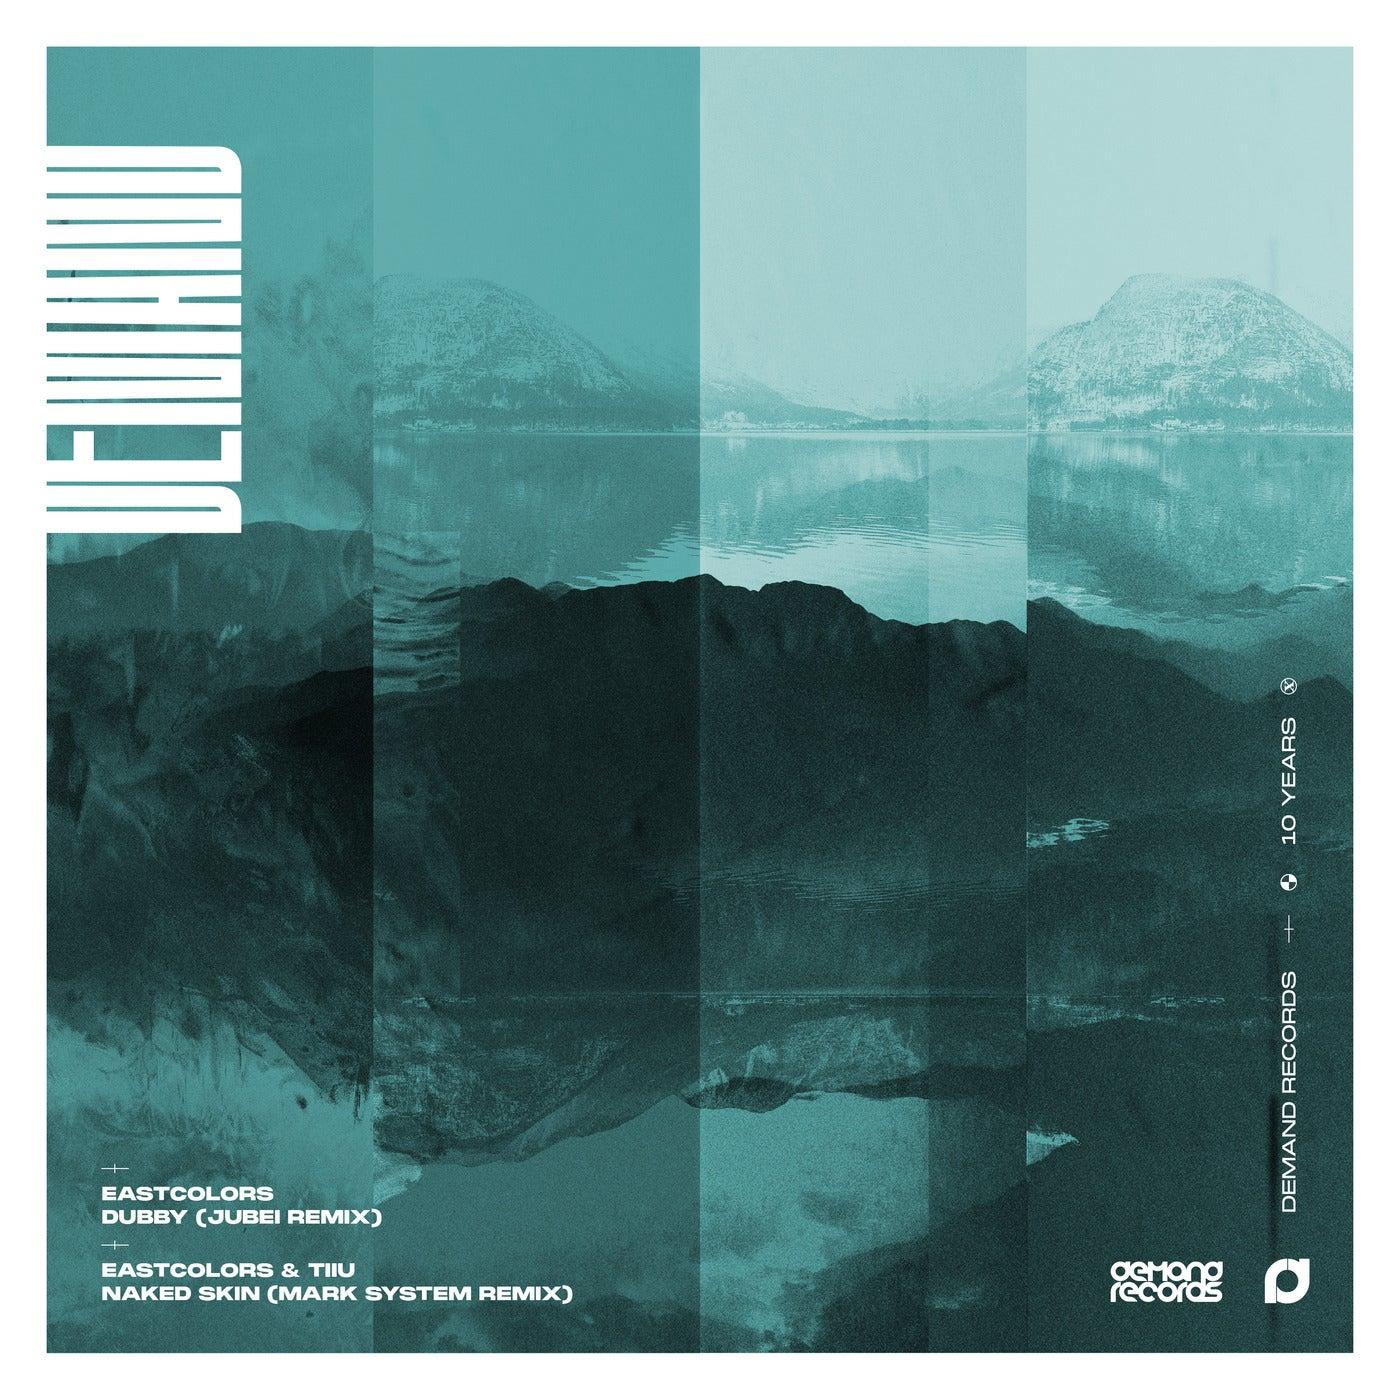 Dubby (Jubei Remix)